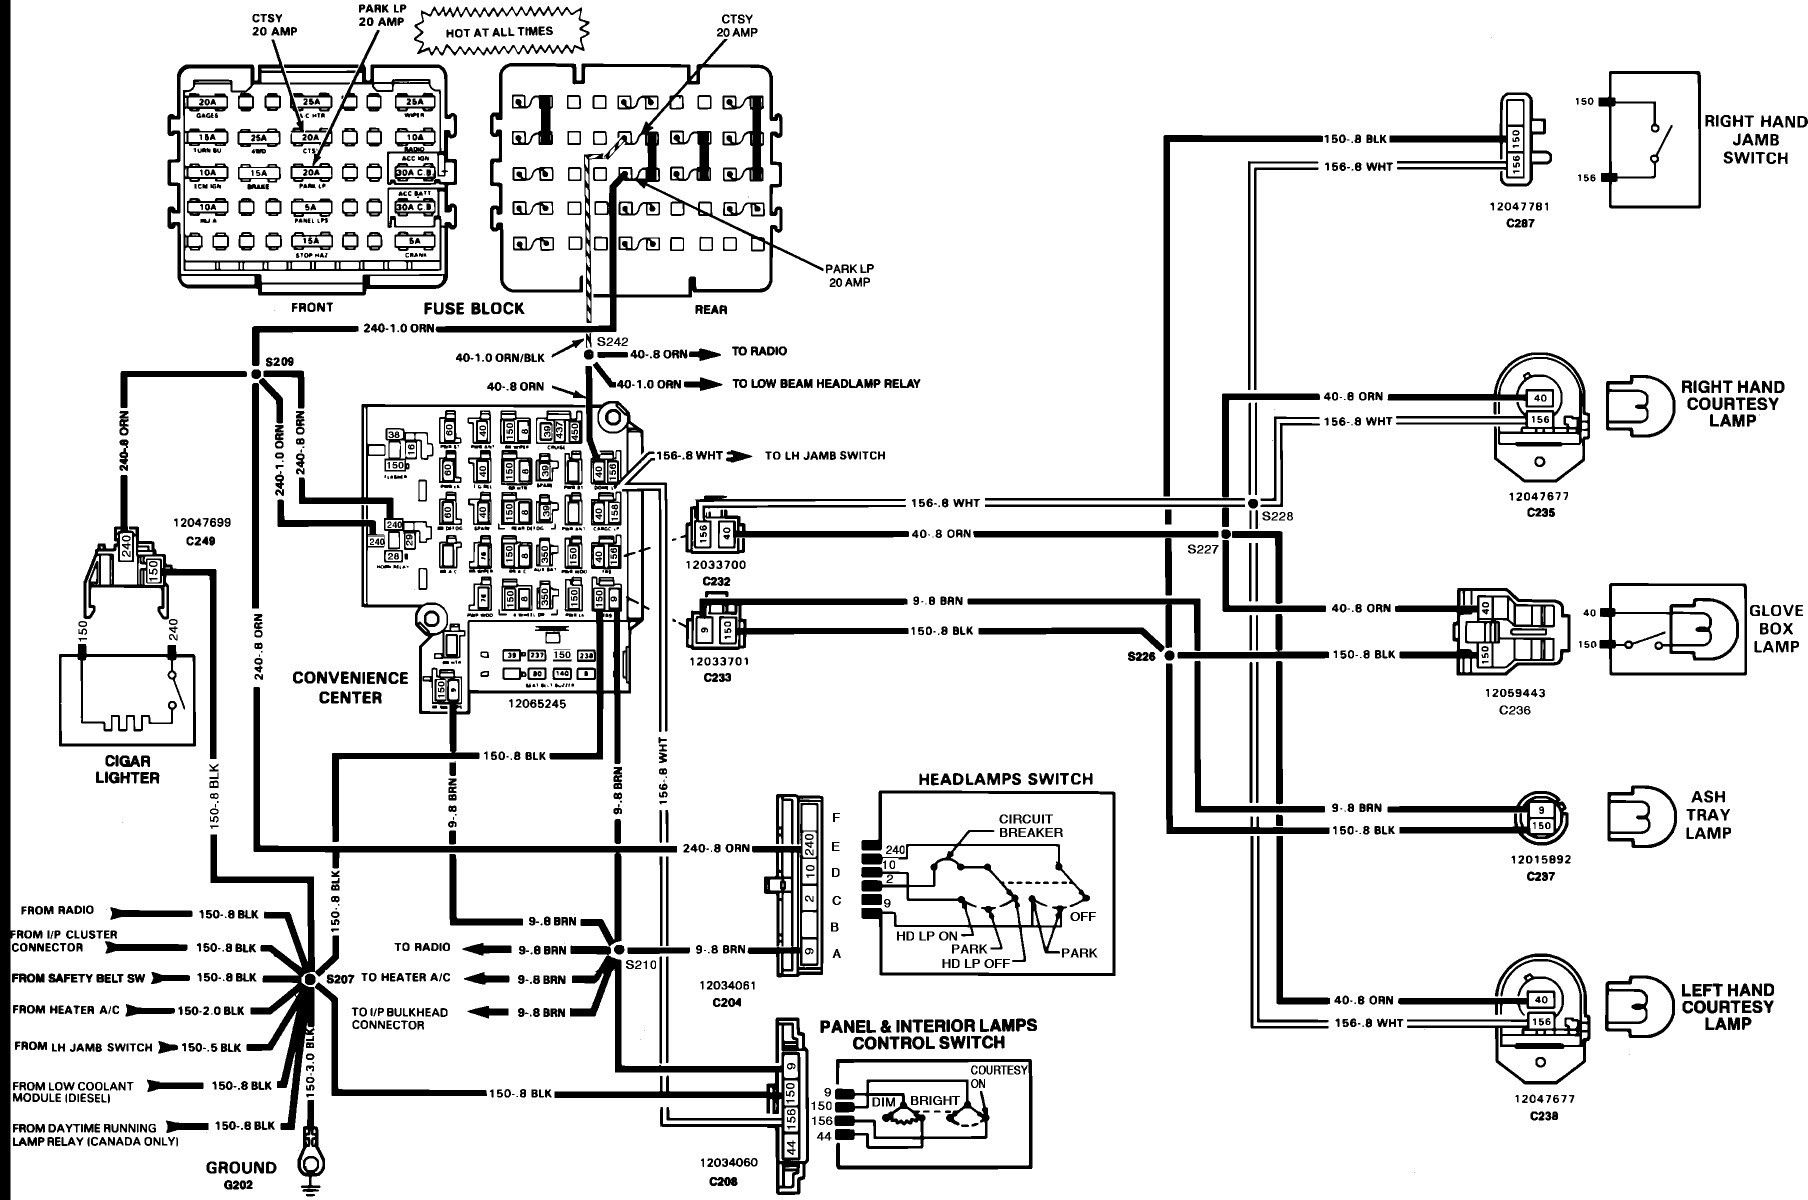 1994 S10 Wiring Diagram : Diagram Wiring Diagrams 1994 S10